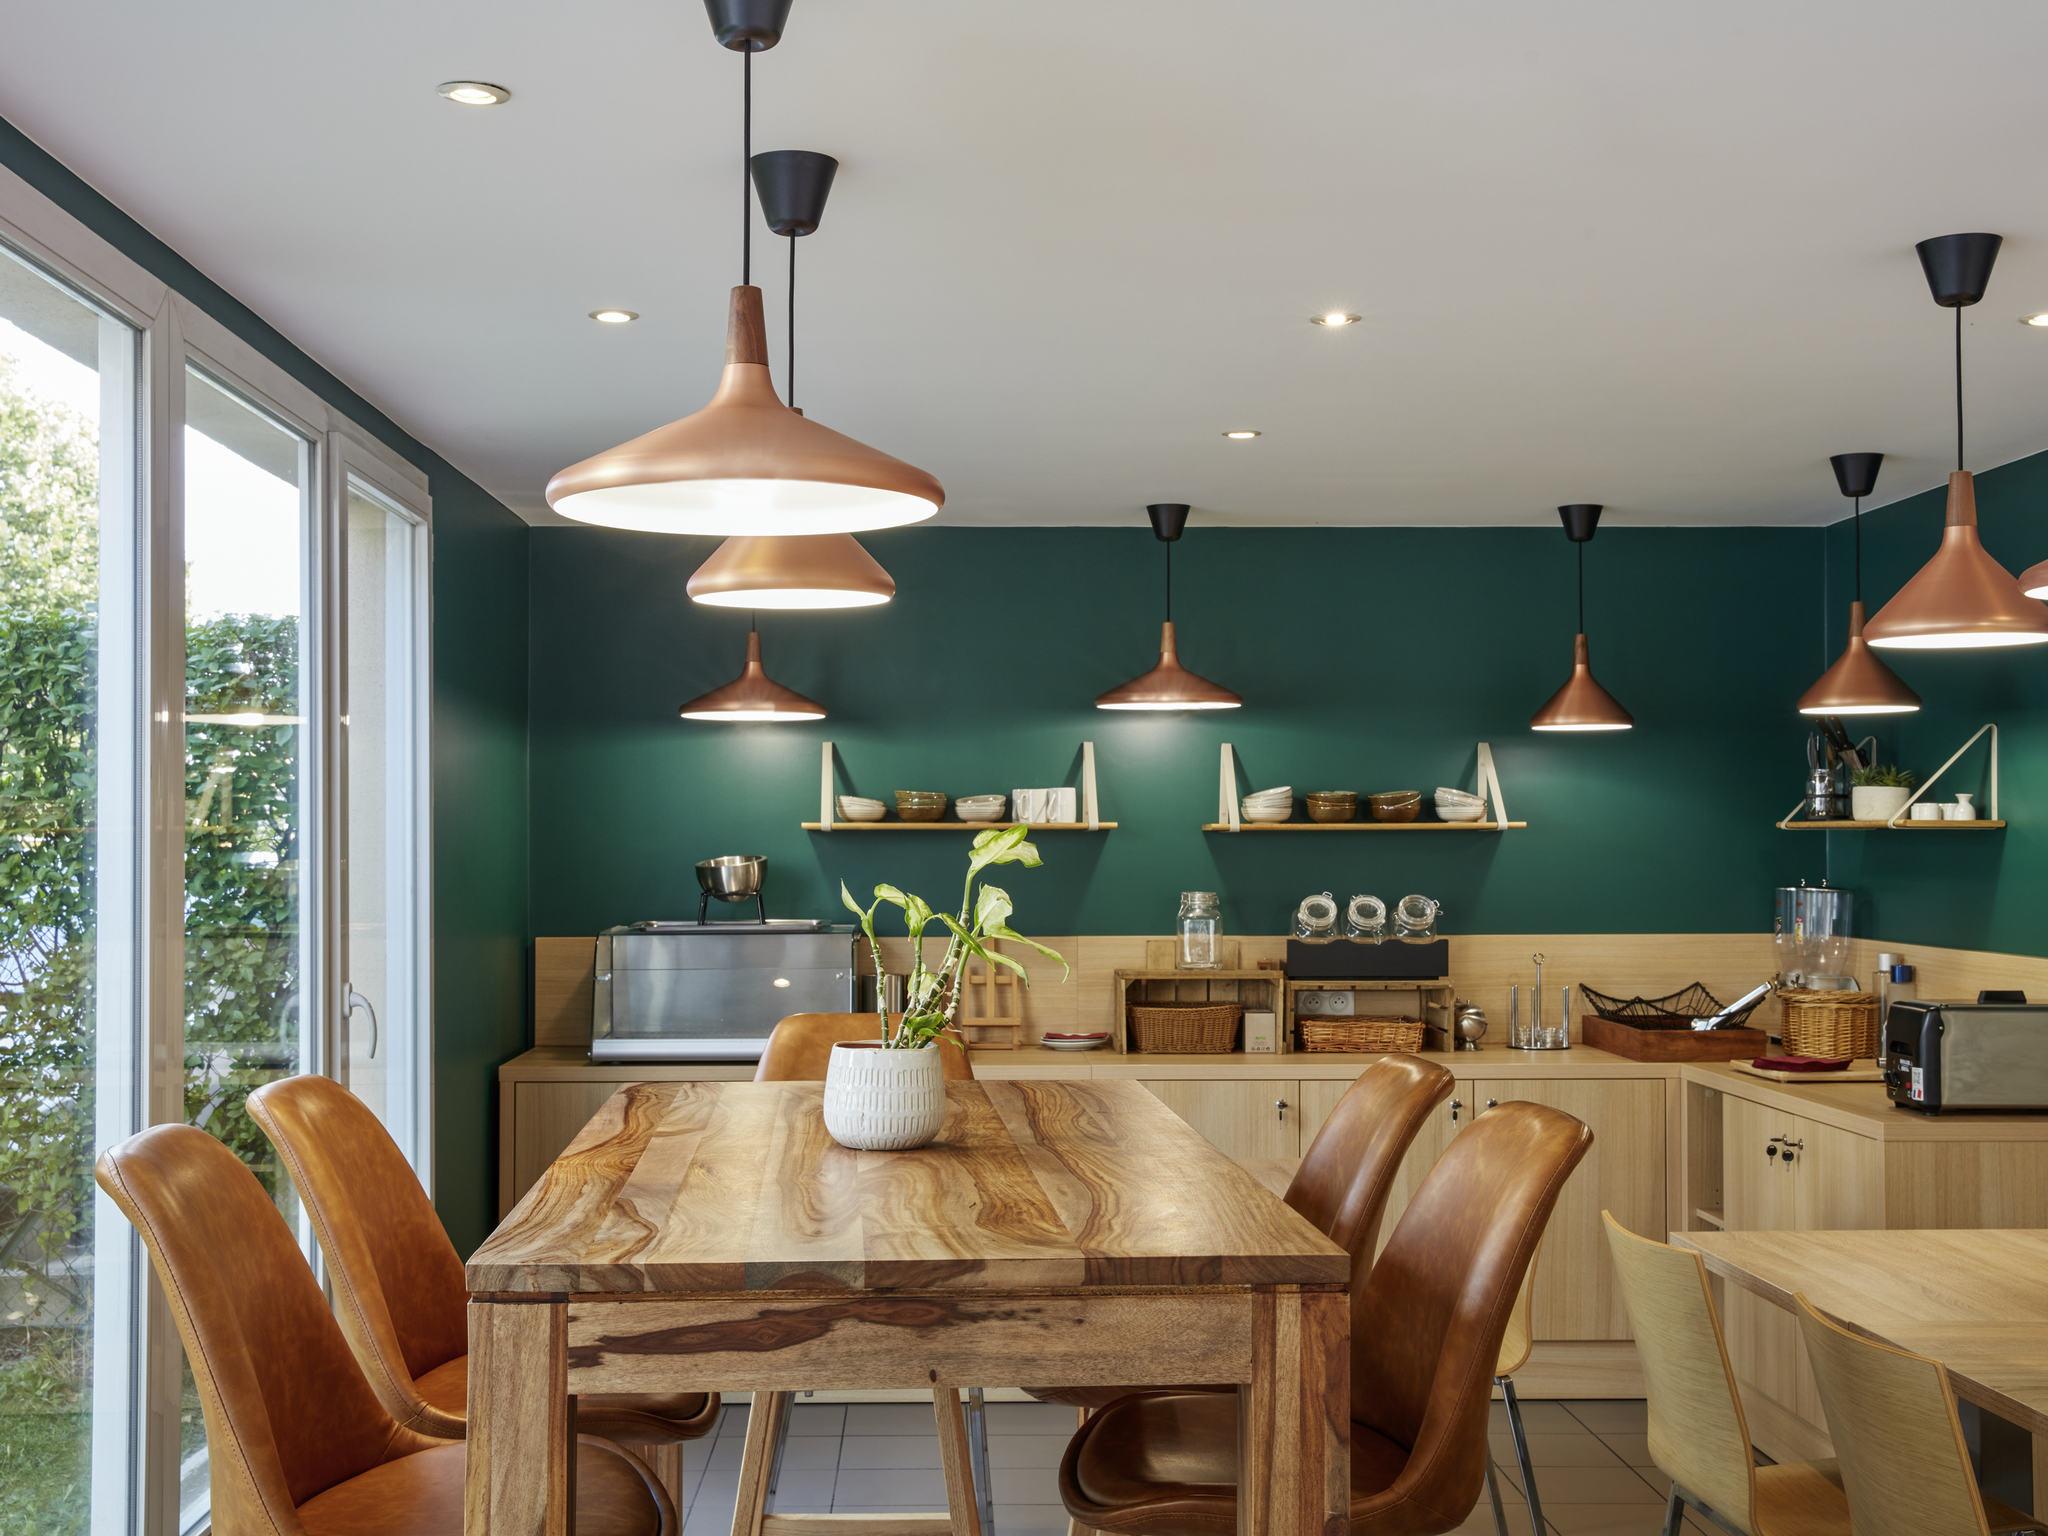 فندق - Aparthotel Adagio access Carrières-sous-Poissy